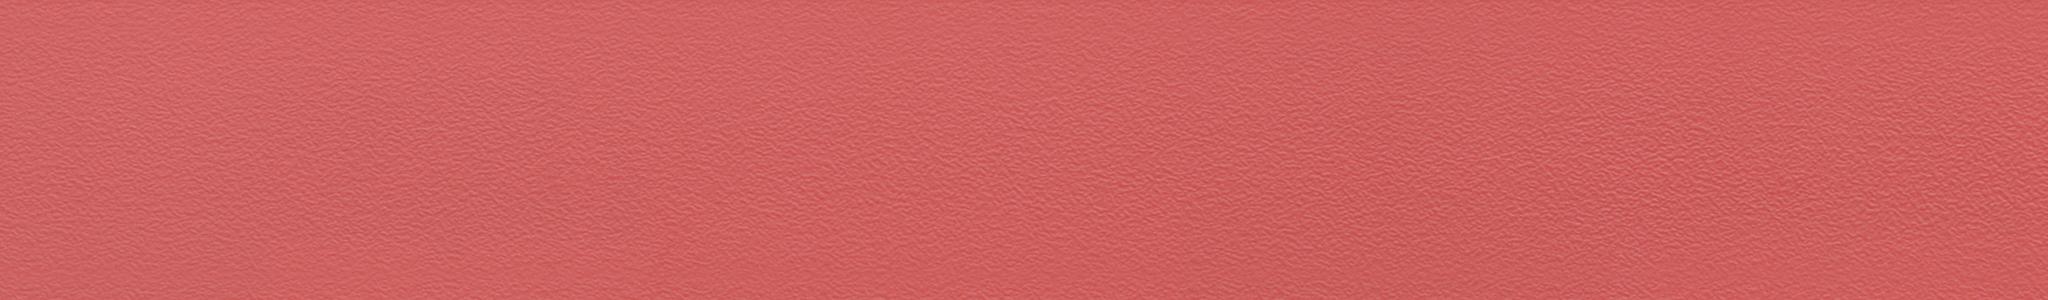 HU 137005 ABS Edge Carmine Red Pearl XG